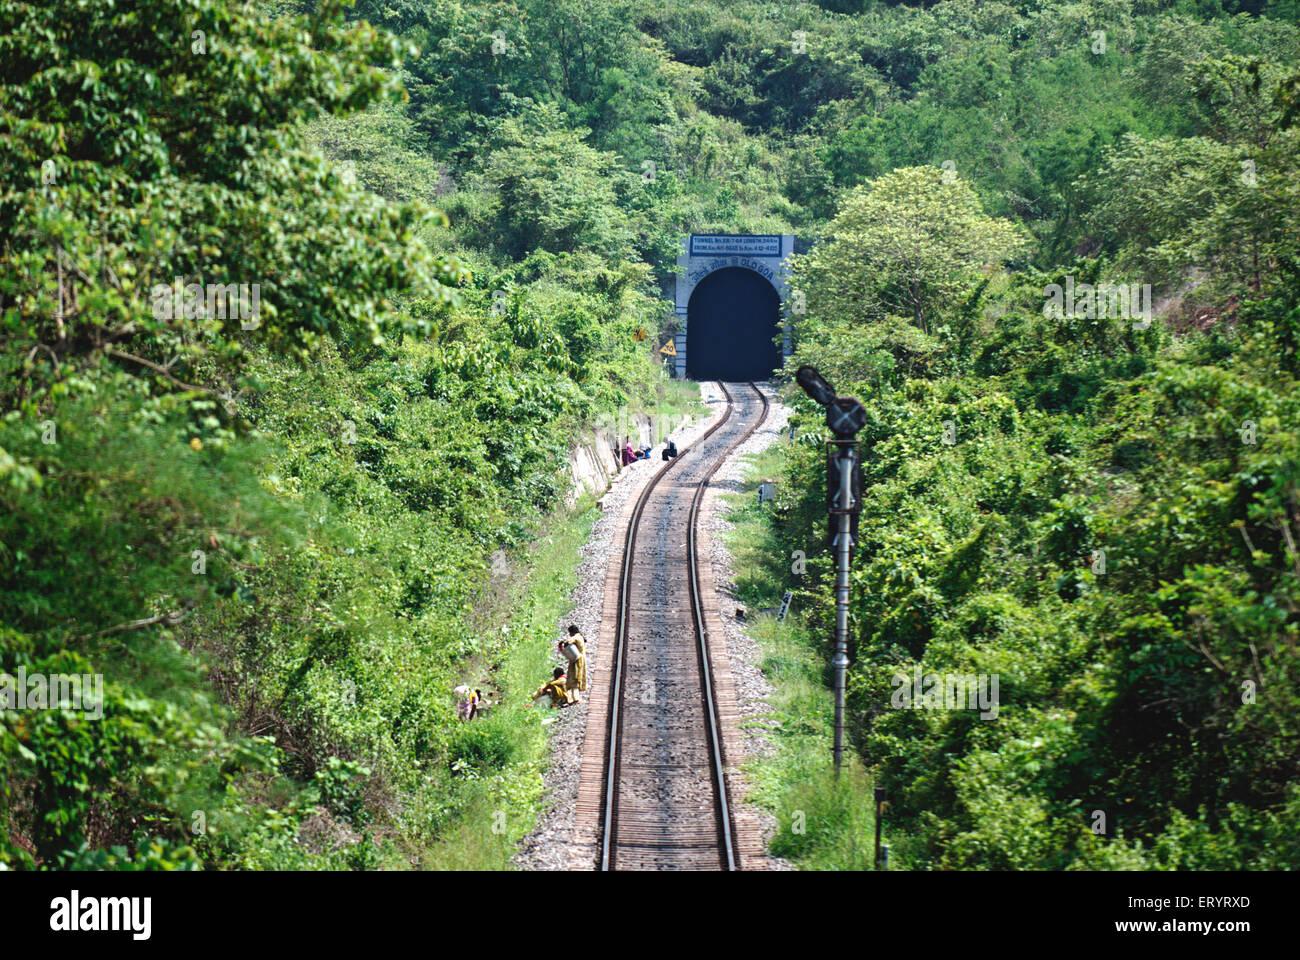 Konkan railroad through trees toward tunnel ; Ponda ; Goa ; India 7 May 2008 Stock Photo